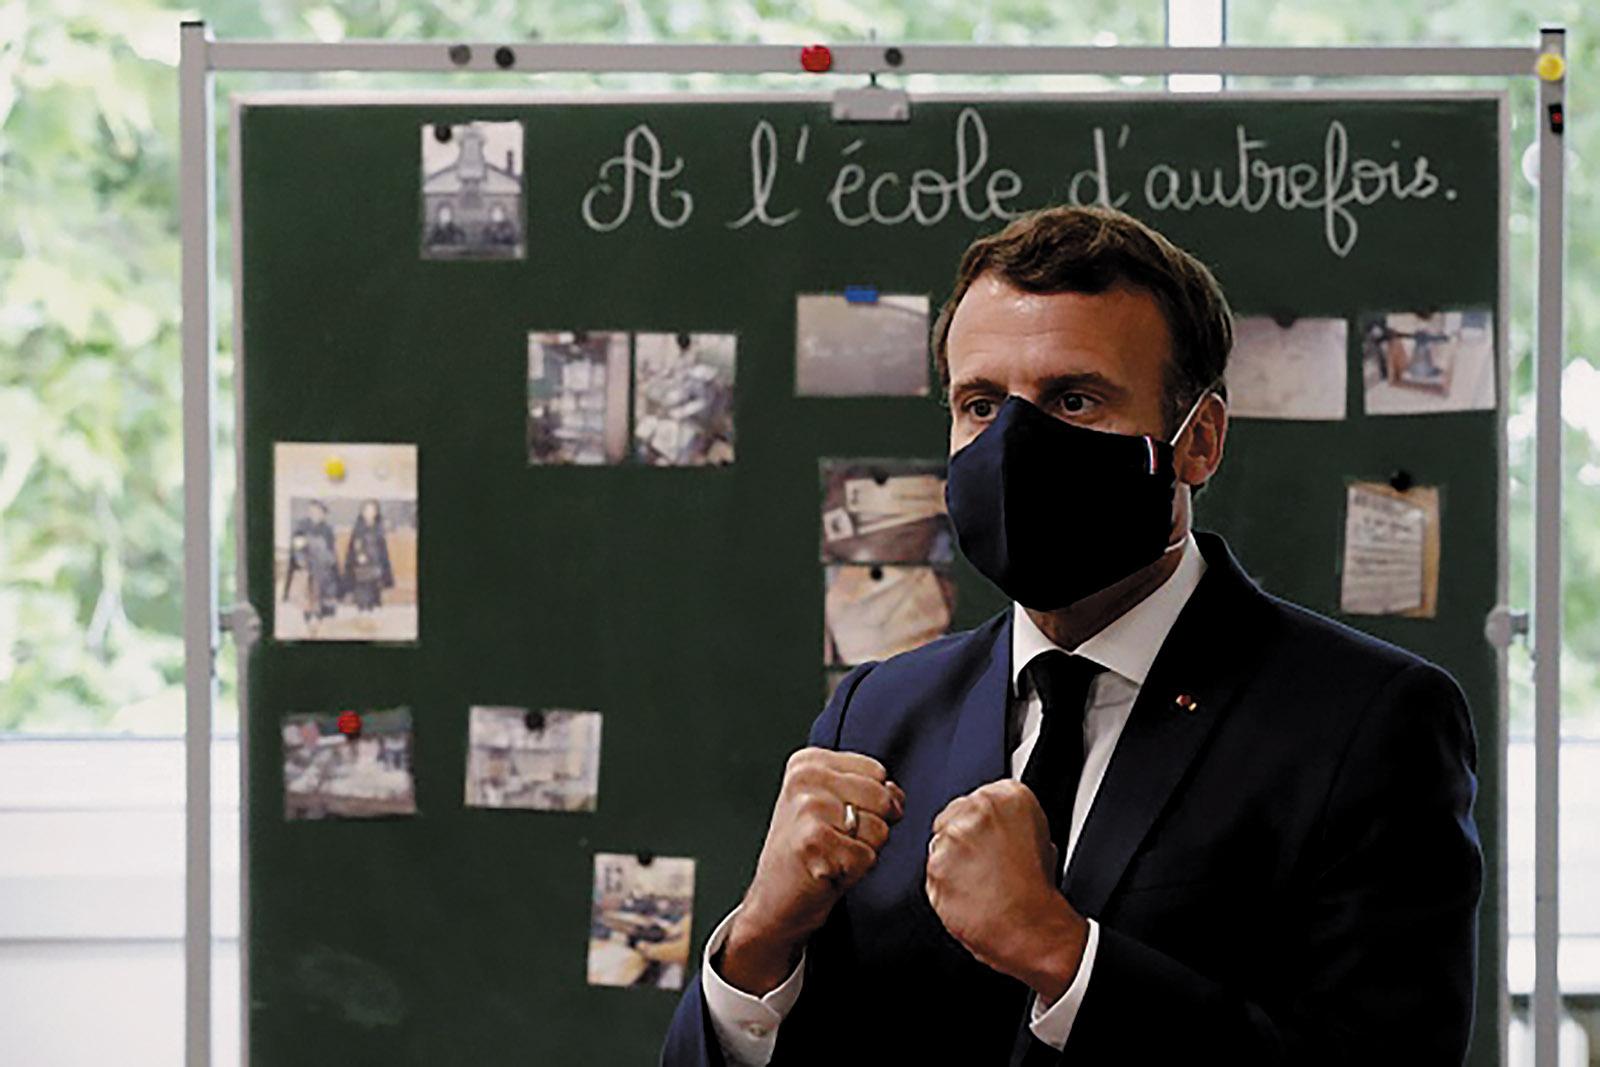 Emmanuel Macron visiting a French elementary school